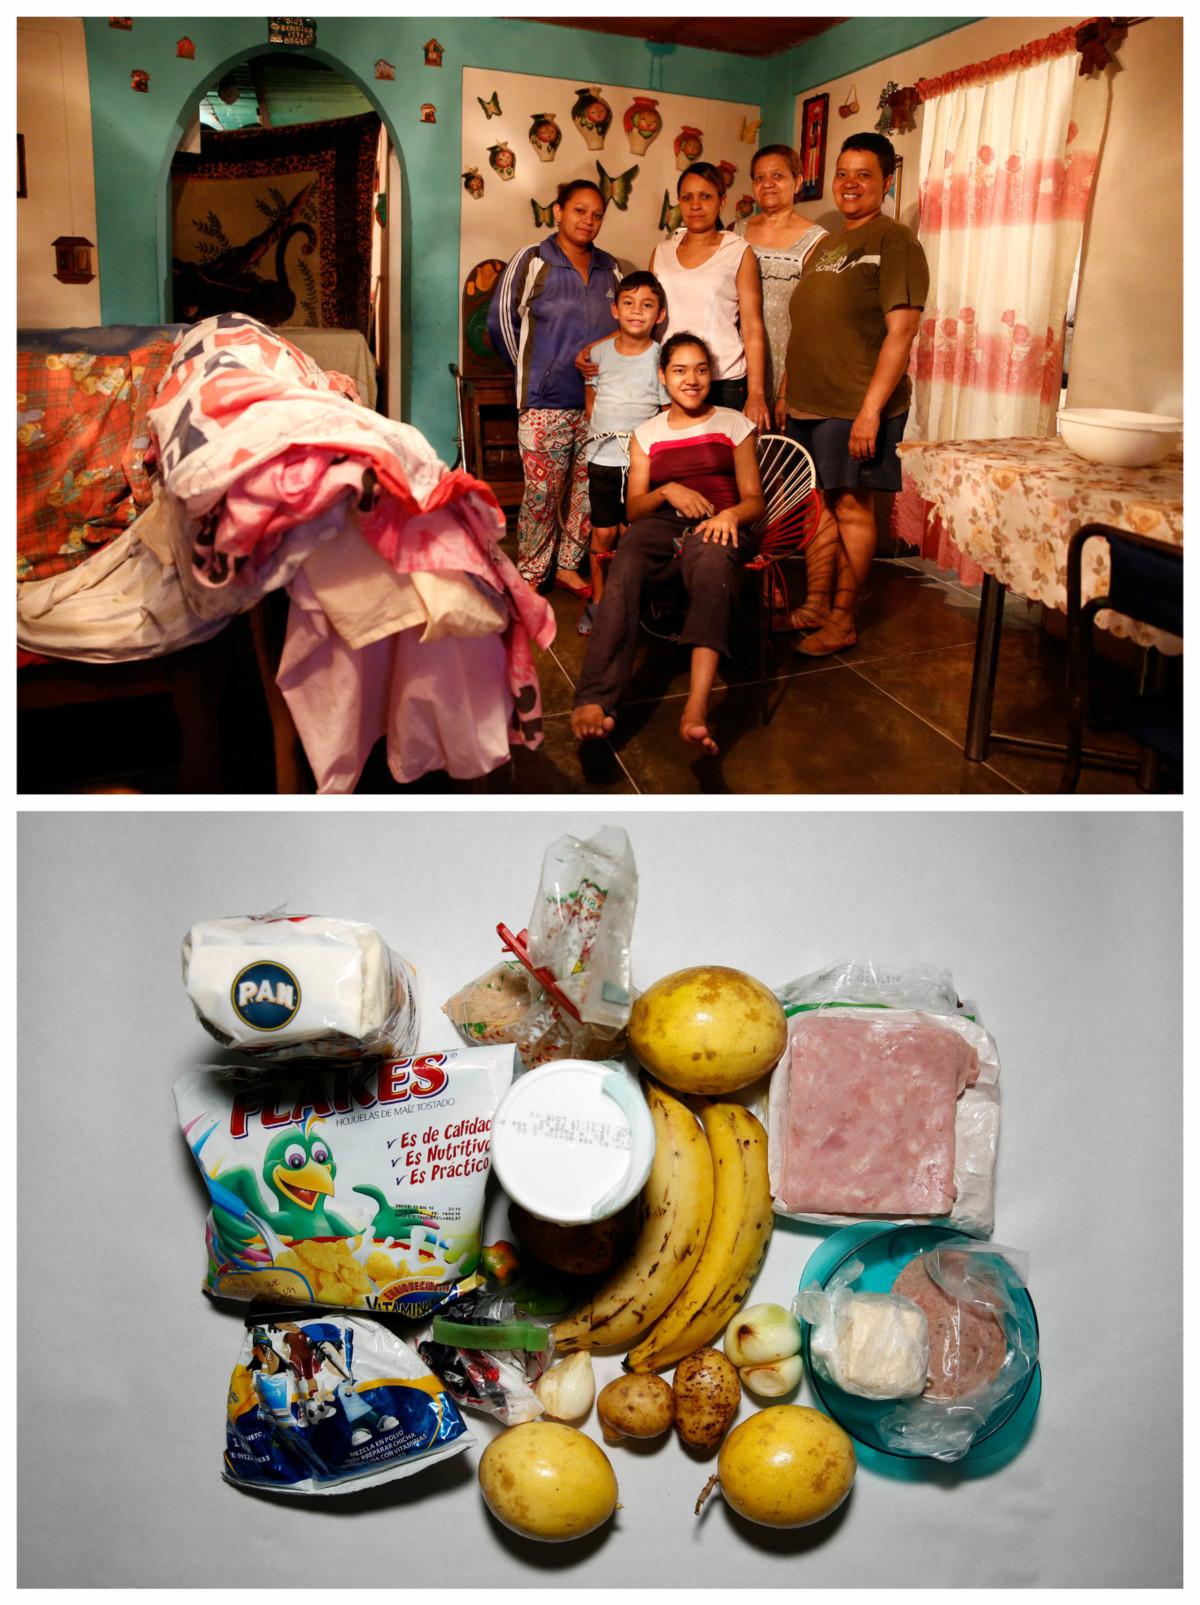 Victoria Mata 一家六口:「我們吃得少了,因為根本找不到食物;當食物出現,又大排長龍,最終也買不到。以前我們一日三餐,現在最多每日兩餐,如果有的話。」